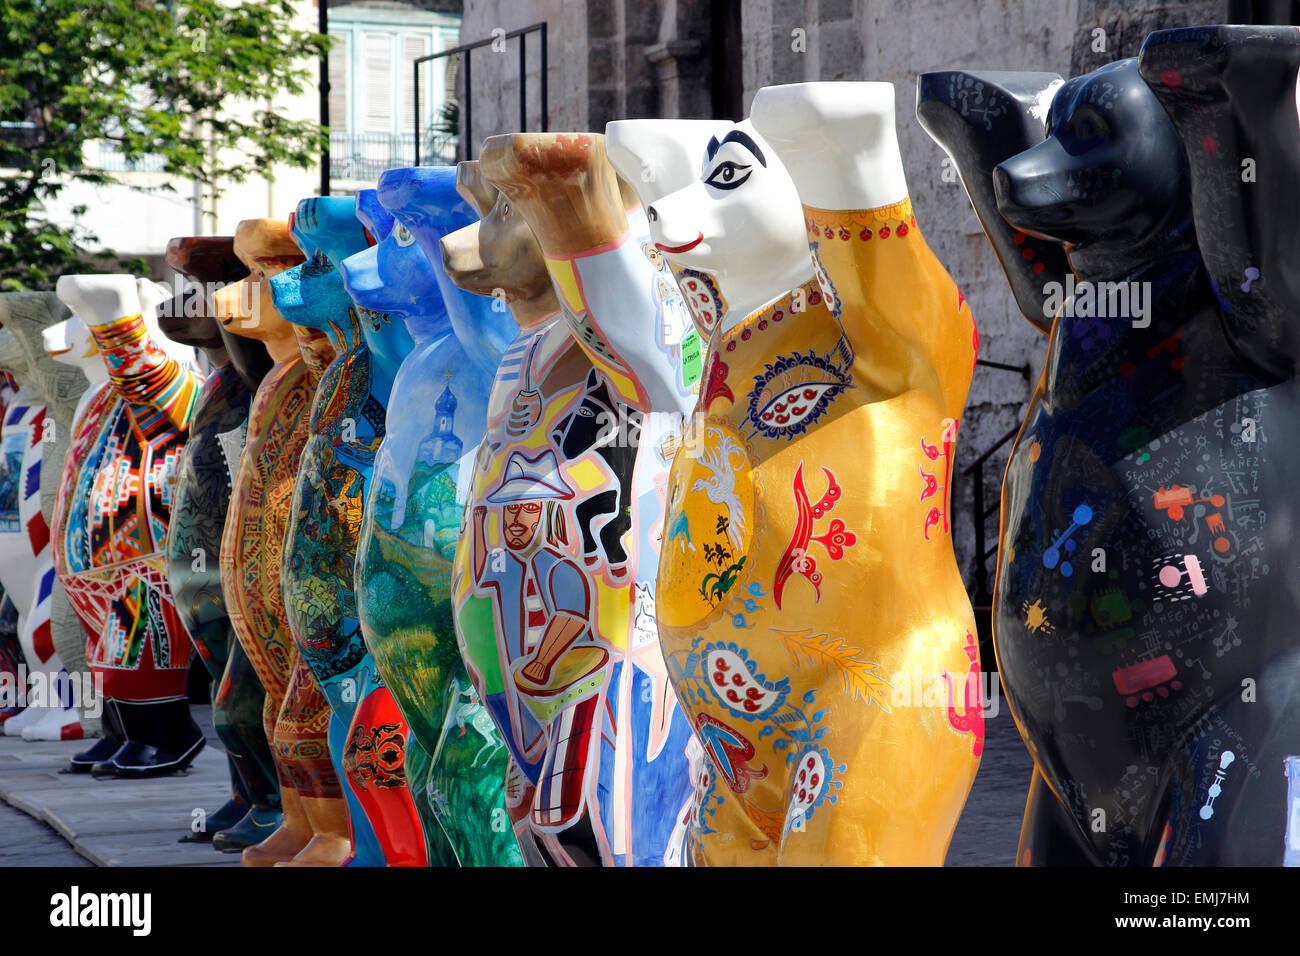 German made 'Buddy Bears' world tour promoting tolerance and understanding Old Town Havana Cuba - Stock Image